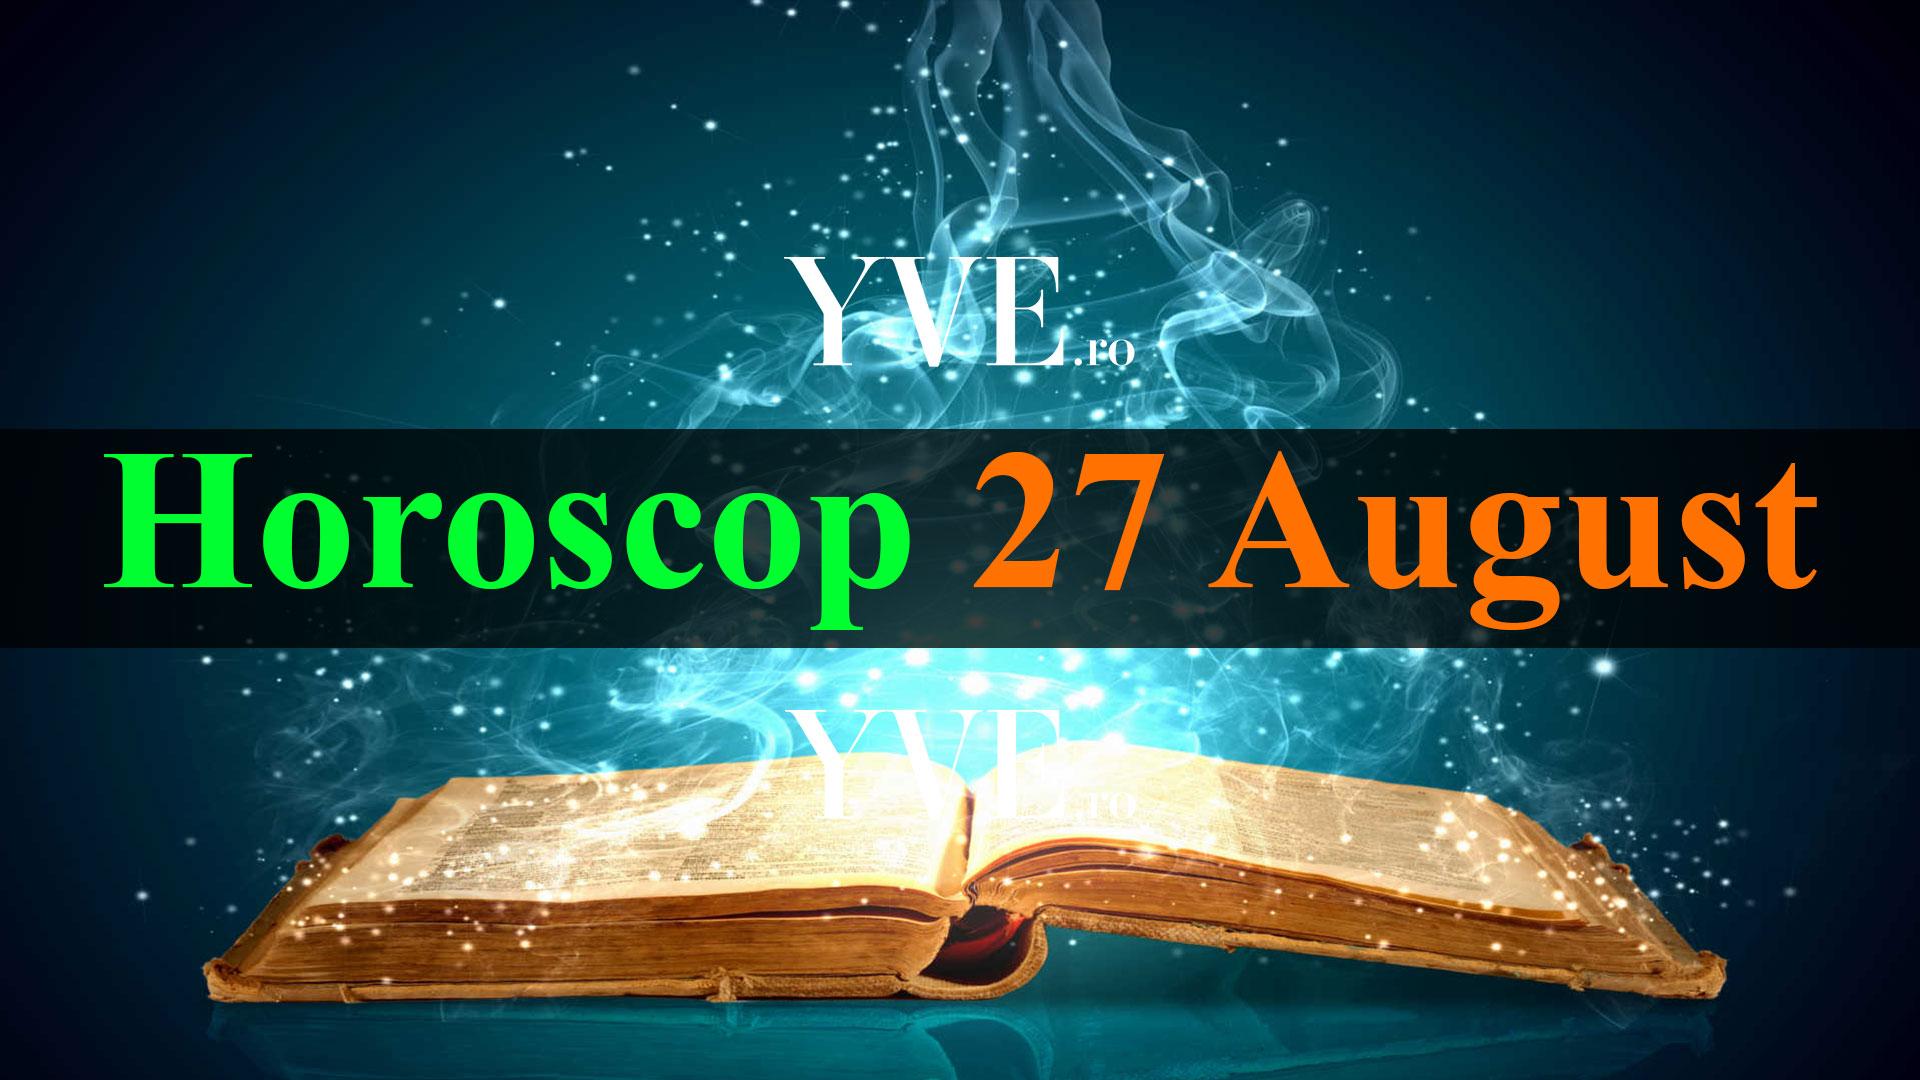 Horoscop 27 August 2019